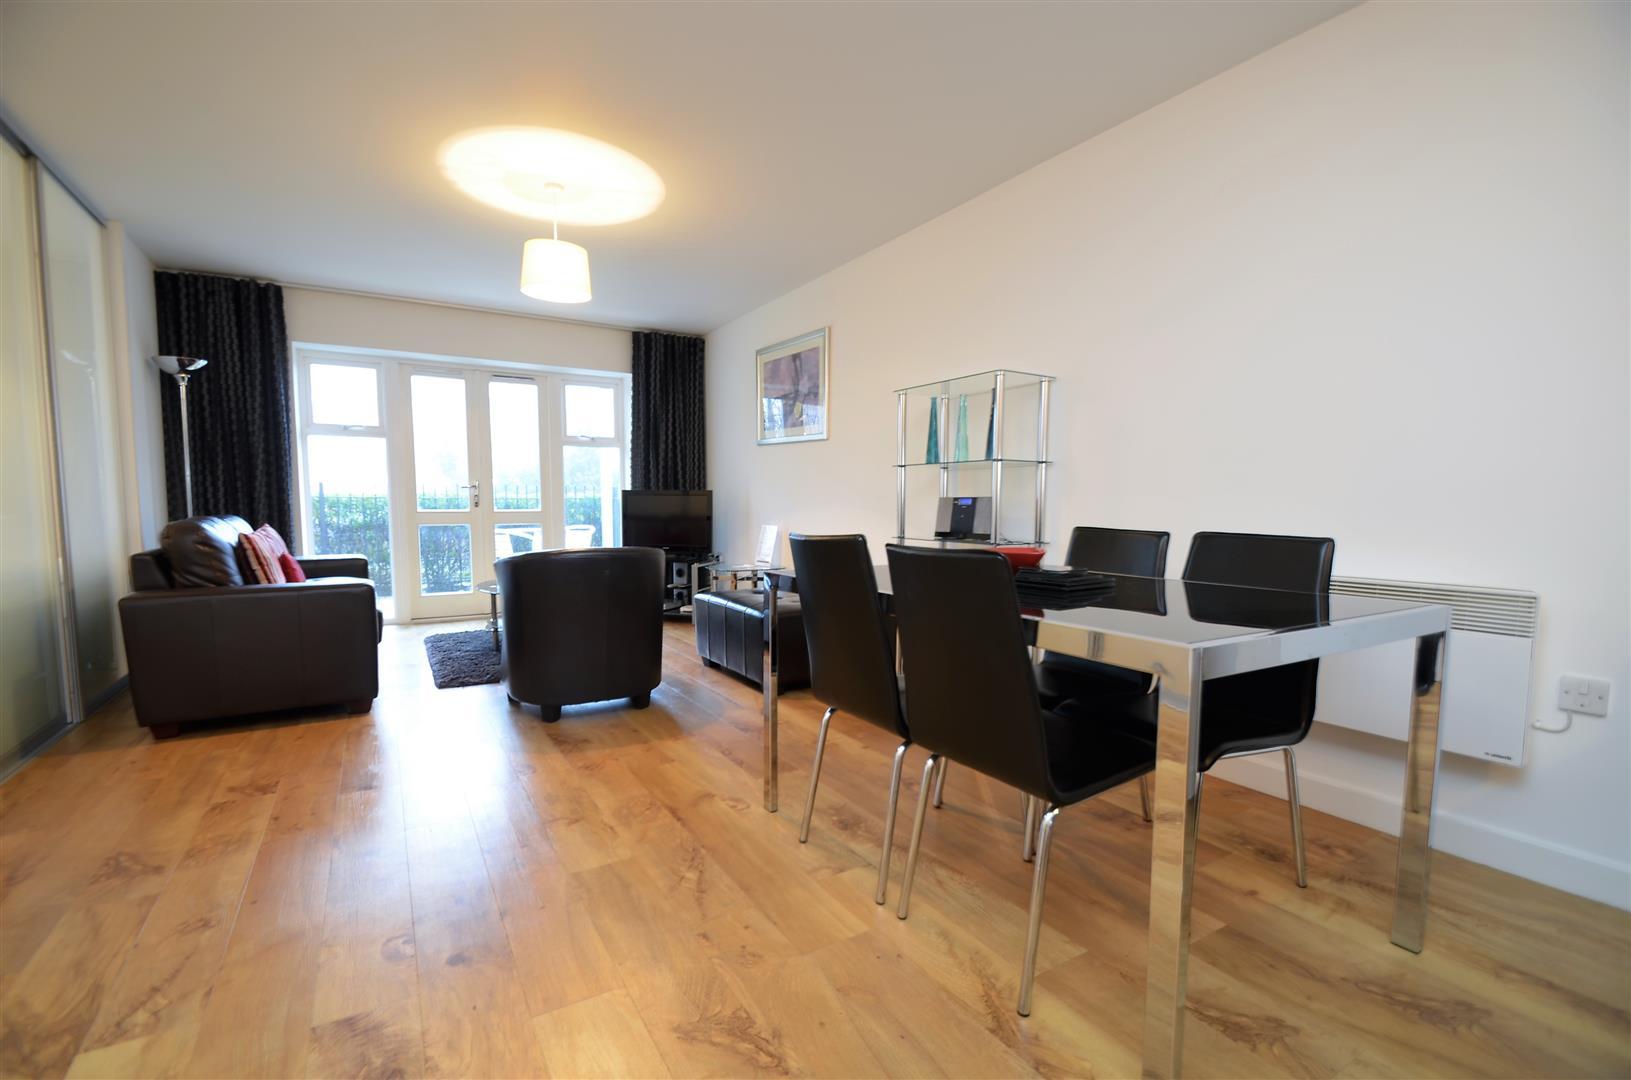 1 Bedroom Flat For Sale In Park Lodge Avenue West Drayton Ub7 London